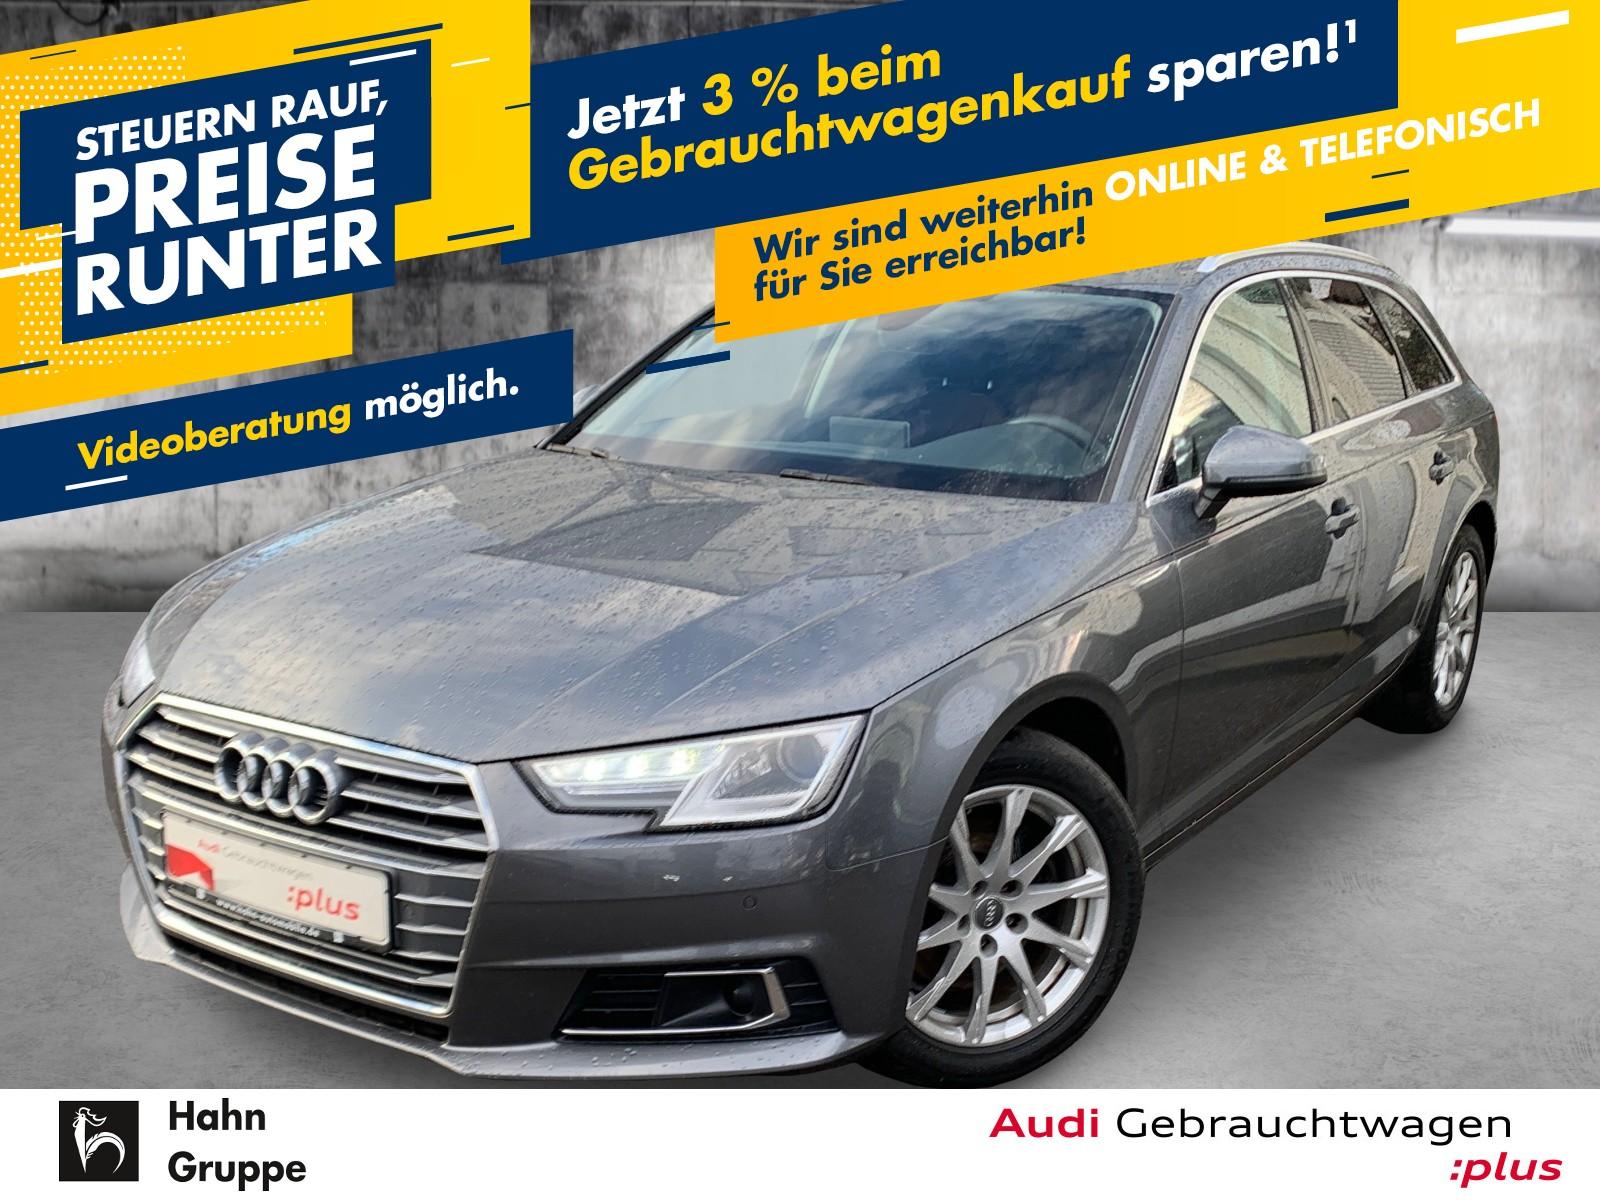 Audi A4 Avant 2.0TDI S-trc Navi Xen Einpark Klima, Jahr 2017, Diesel